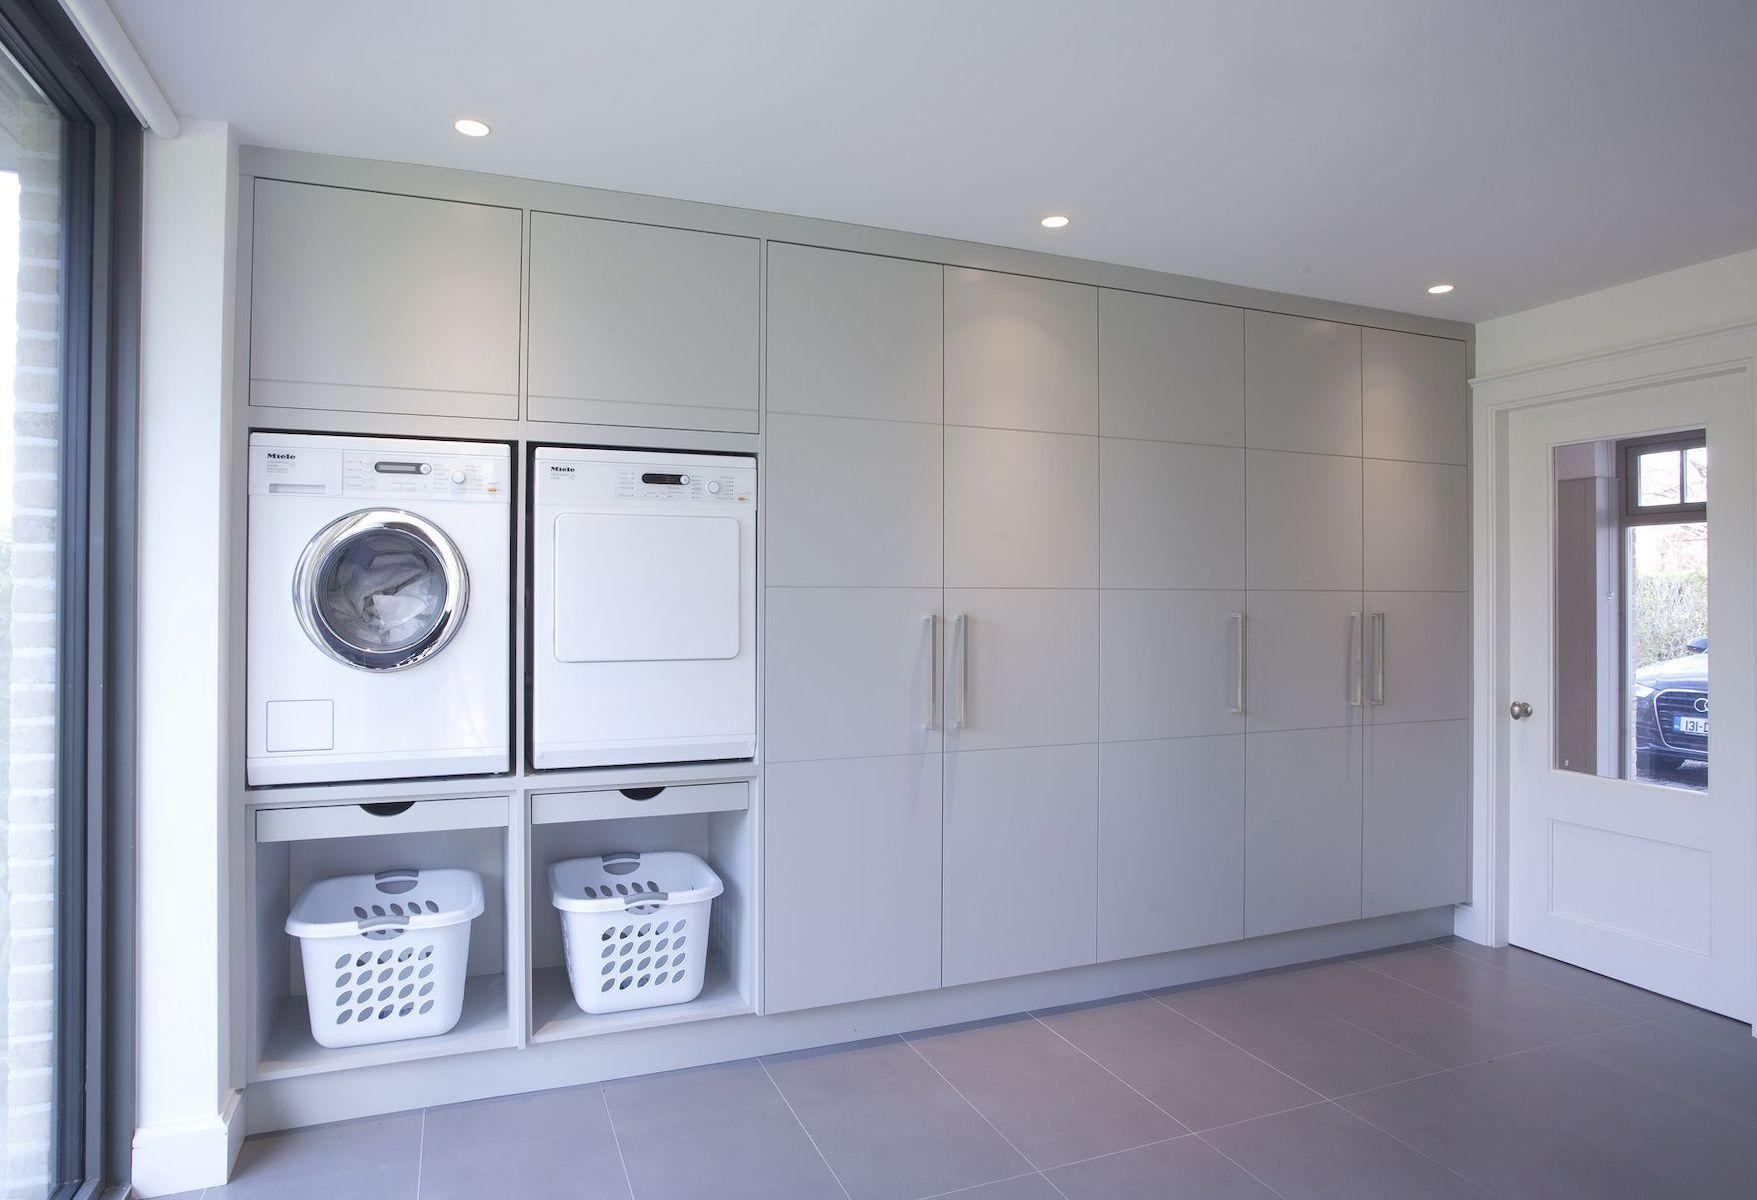 Tricks Building Idea Specifications For A Laundry Room Yellowraises Waschkuche Building Eyeshado In 2020 Abstellraumideen Waschelager Waschkuchenorganisation